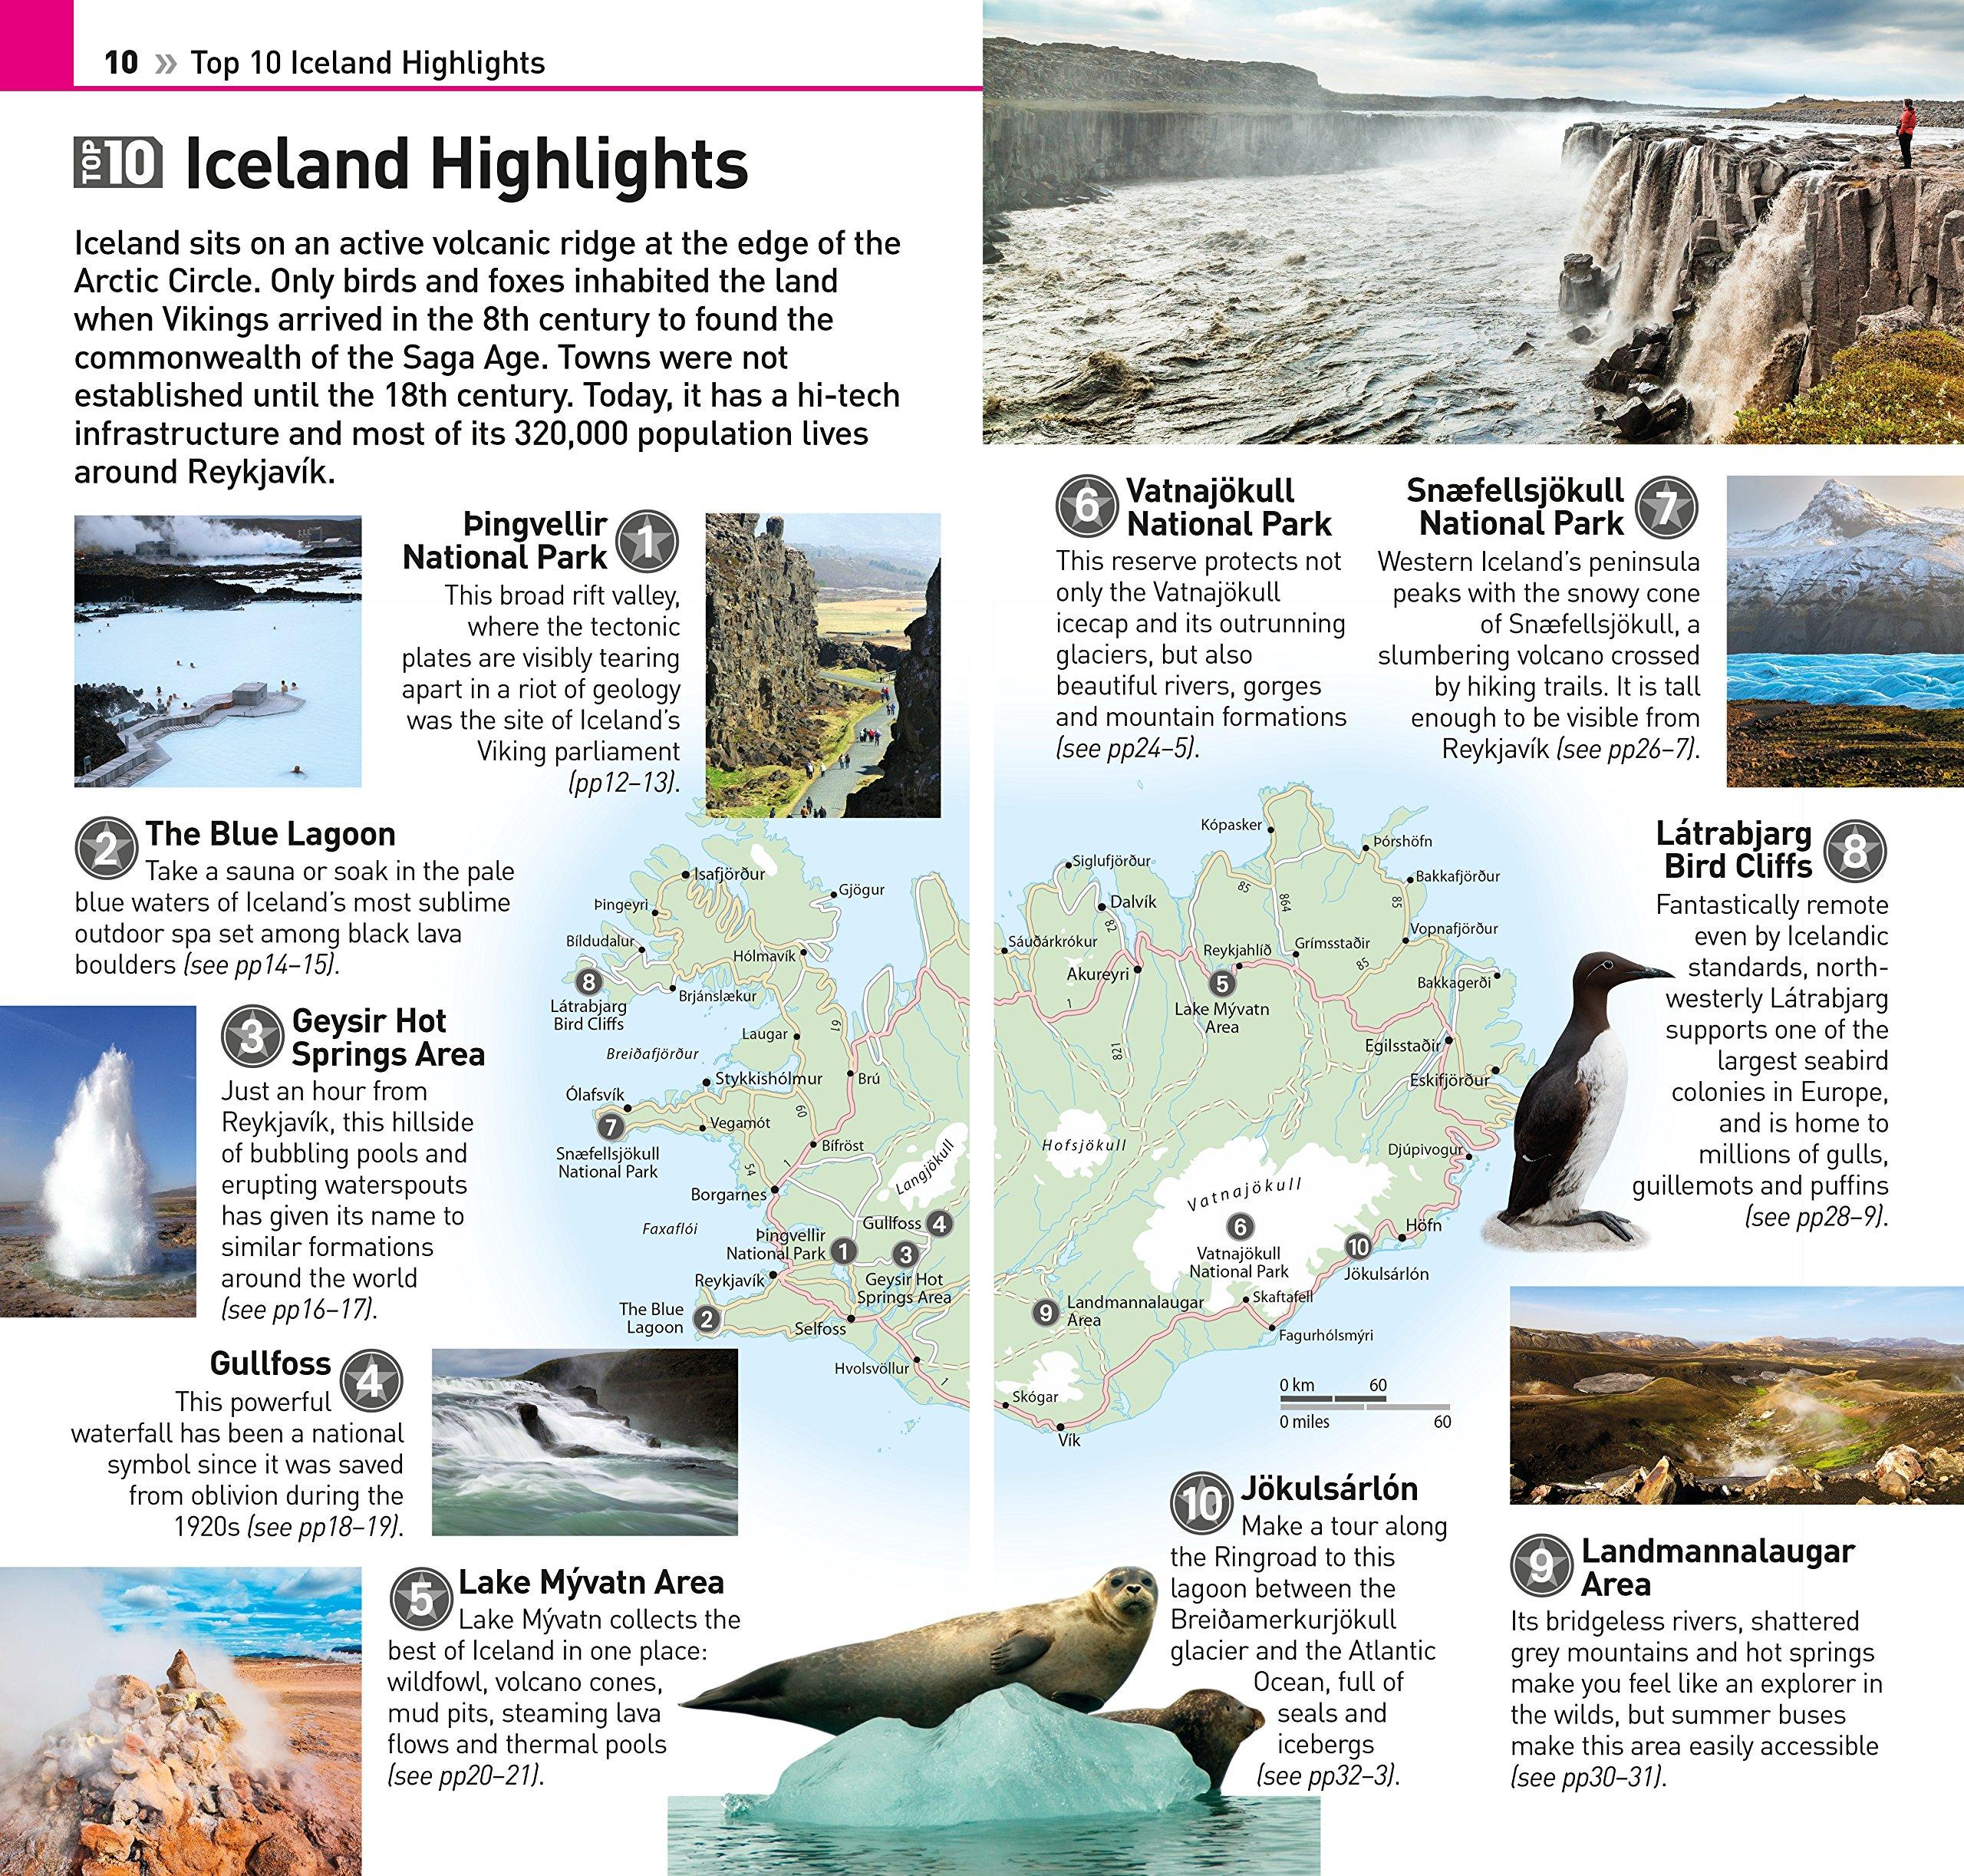 Top 10 Iceland Eyewitness Travel Guide DK 9781465440938 Amazon Books